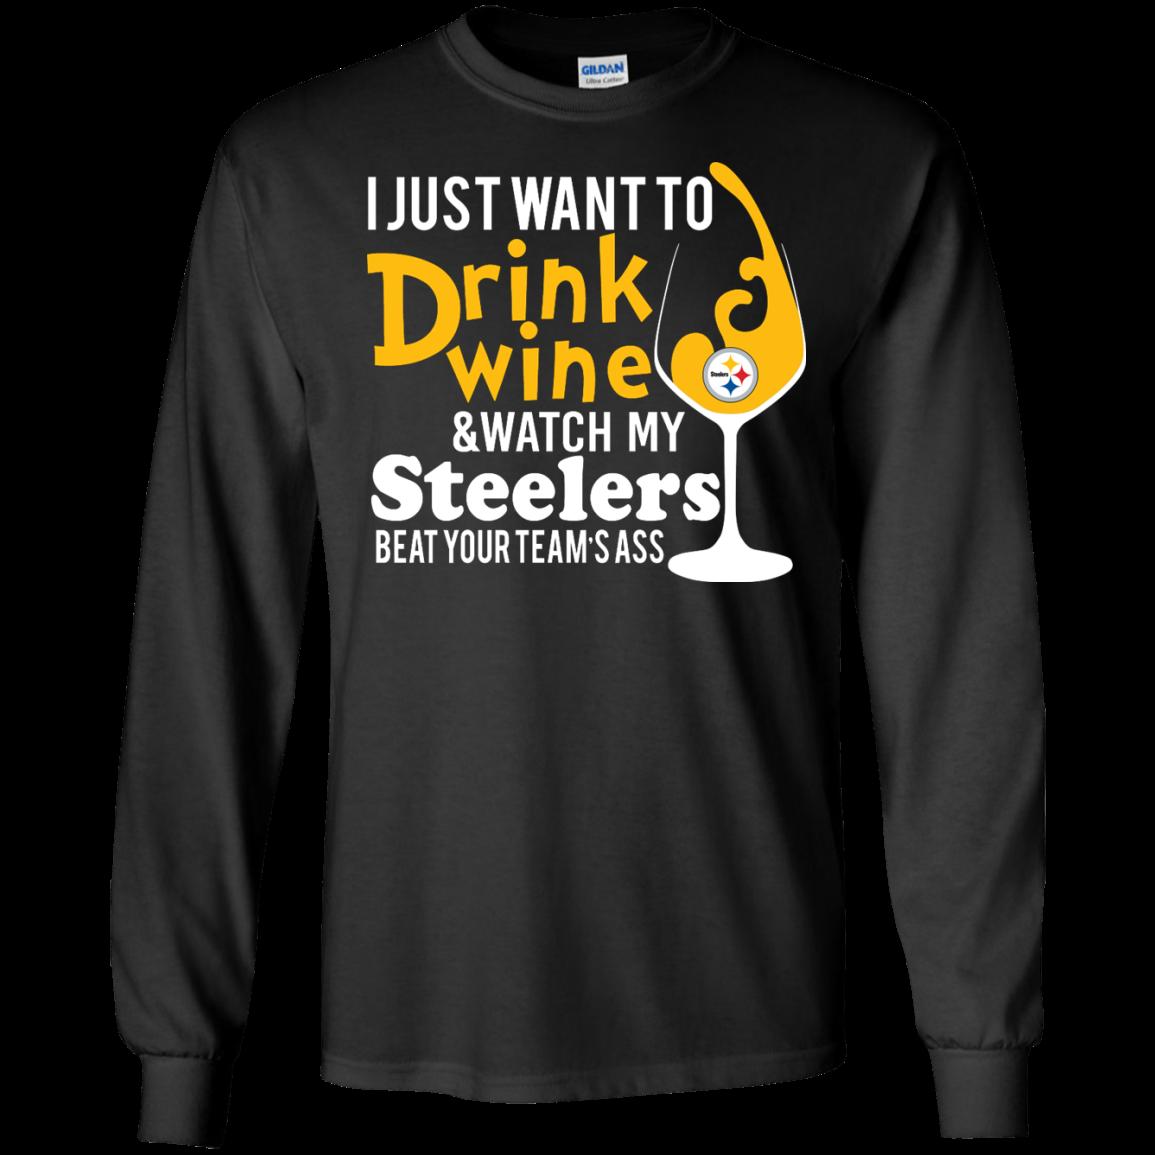 buy online 3571e 31743 I just want to drink wine & watch my steelers tshirt, vneck, tank, hoodie